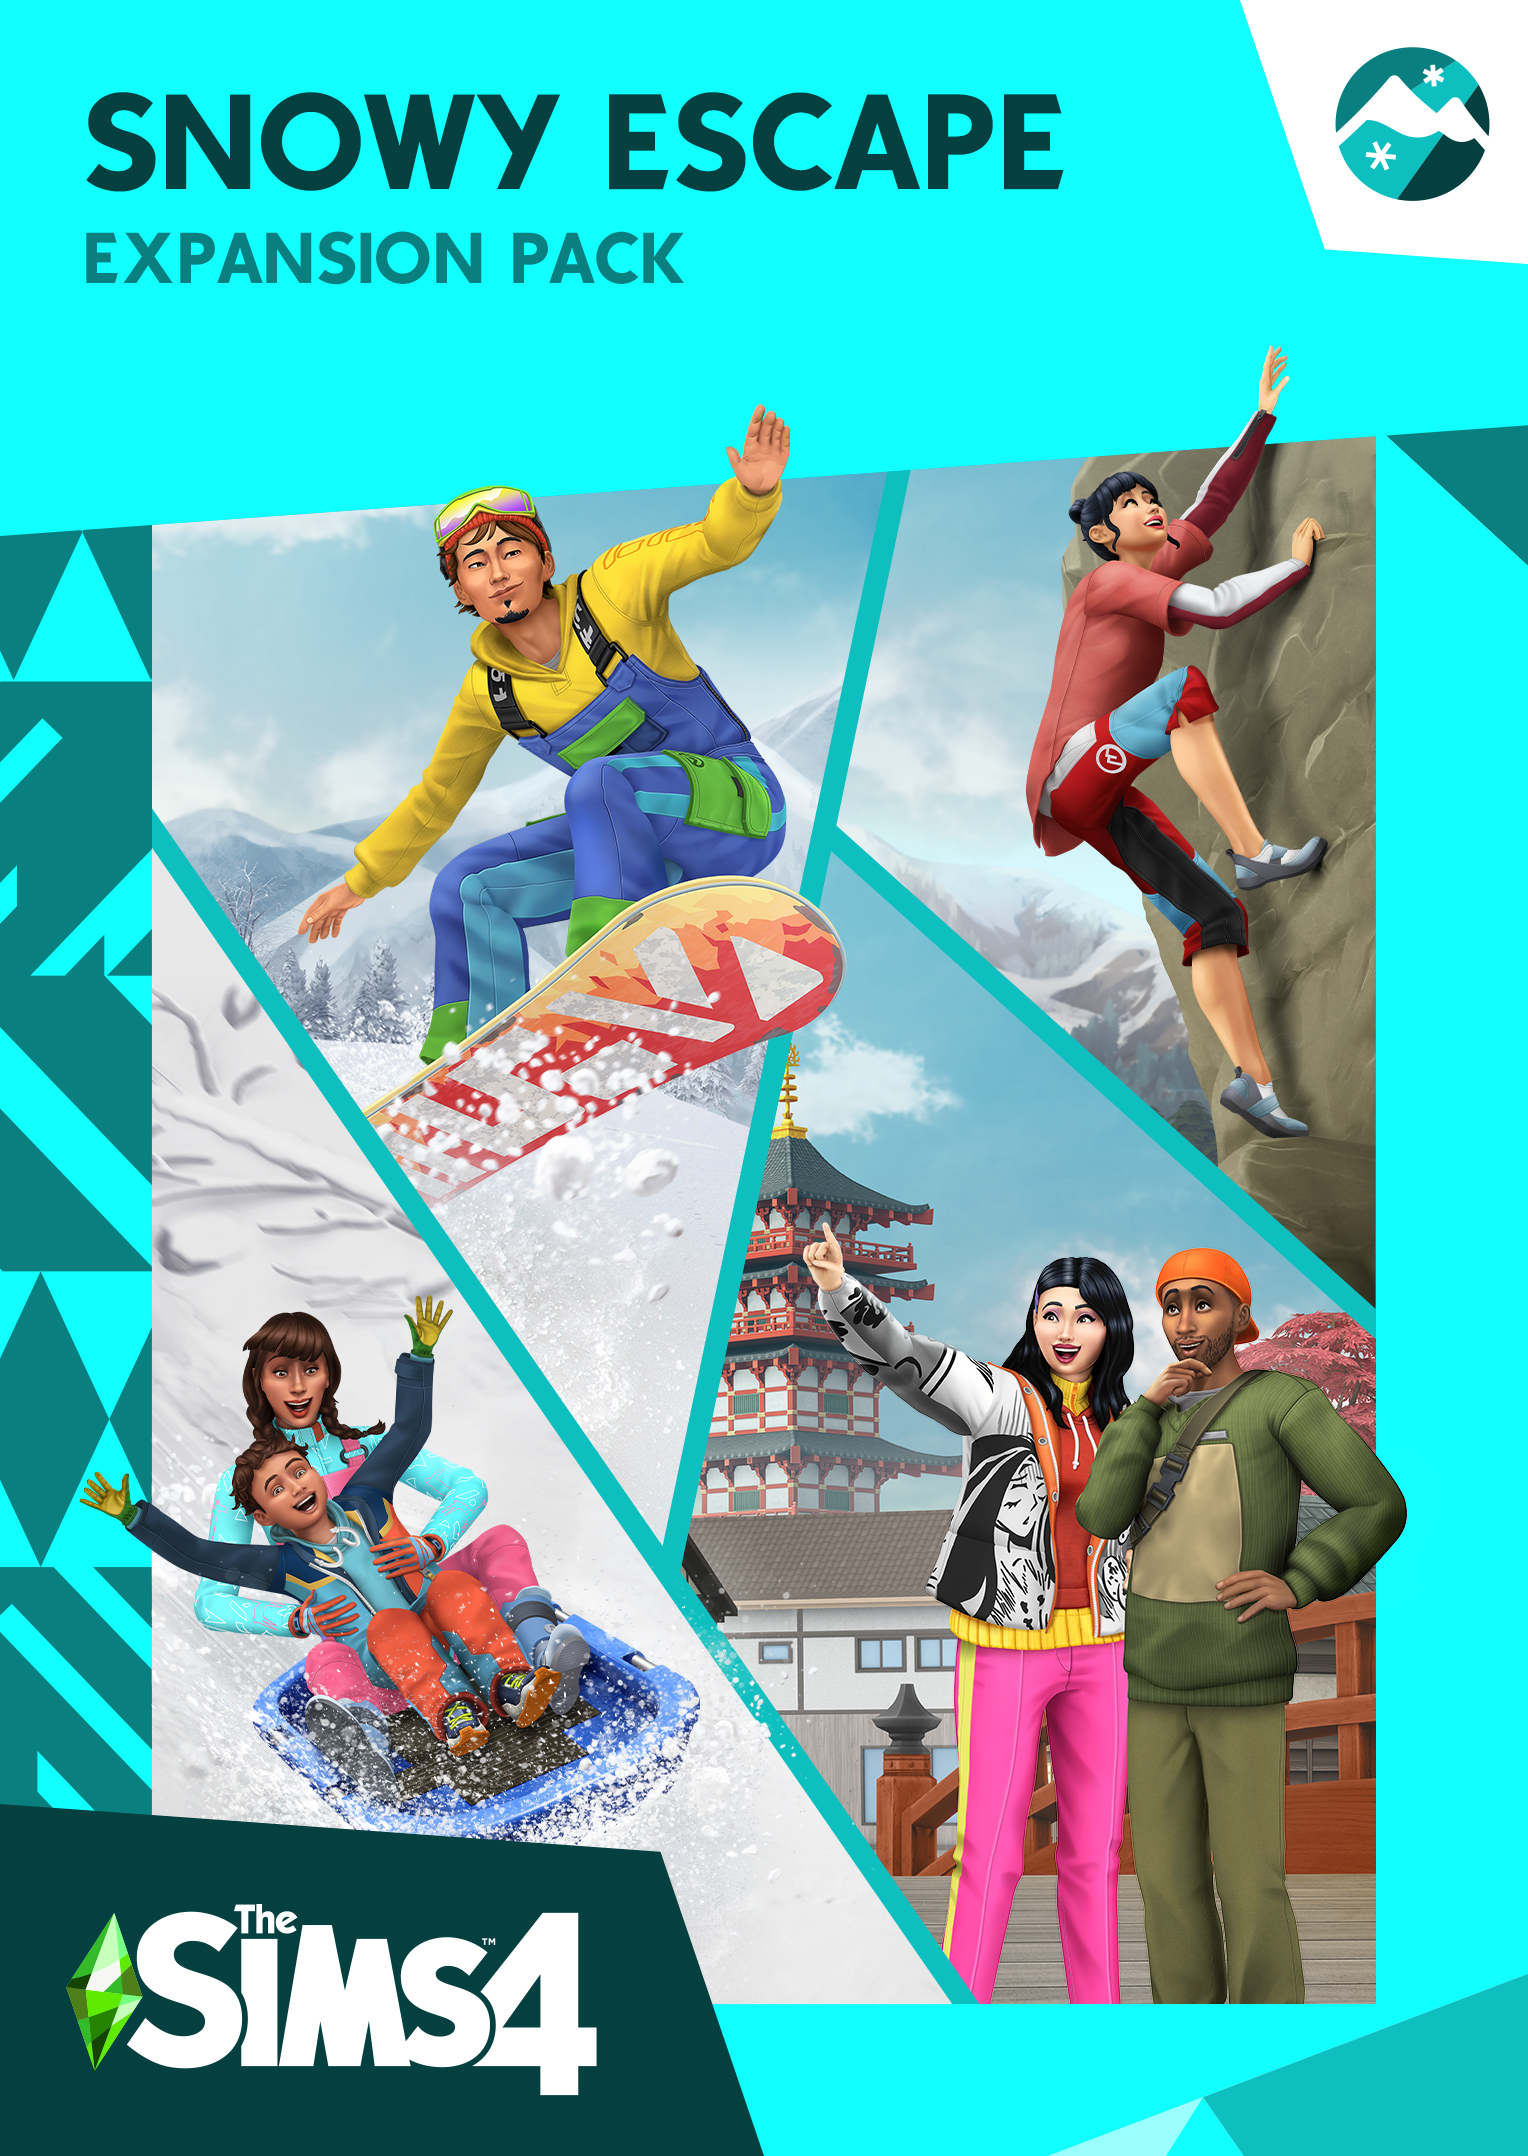 The Sims 4 Snowy Escape Header